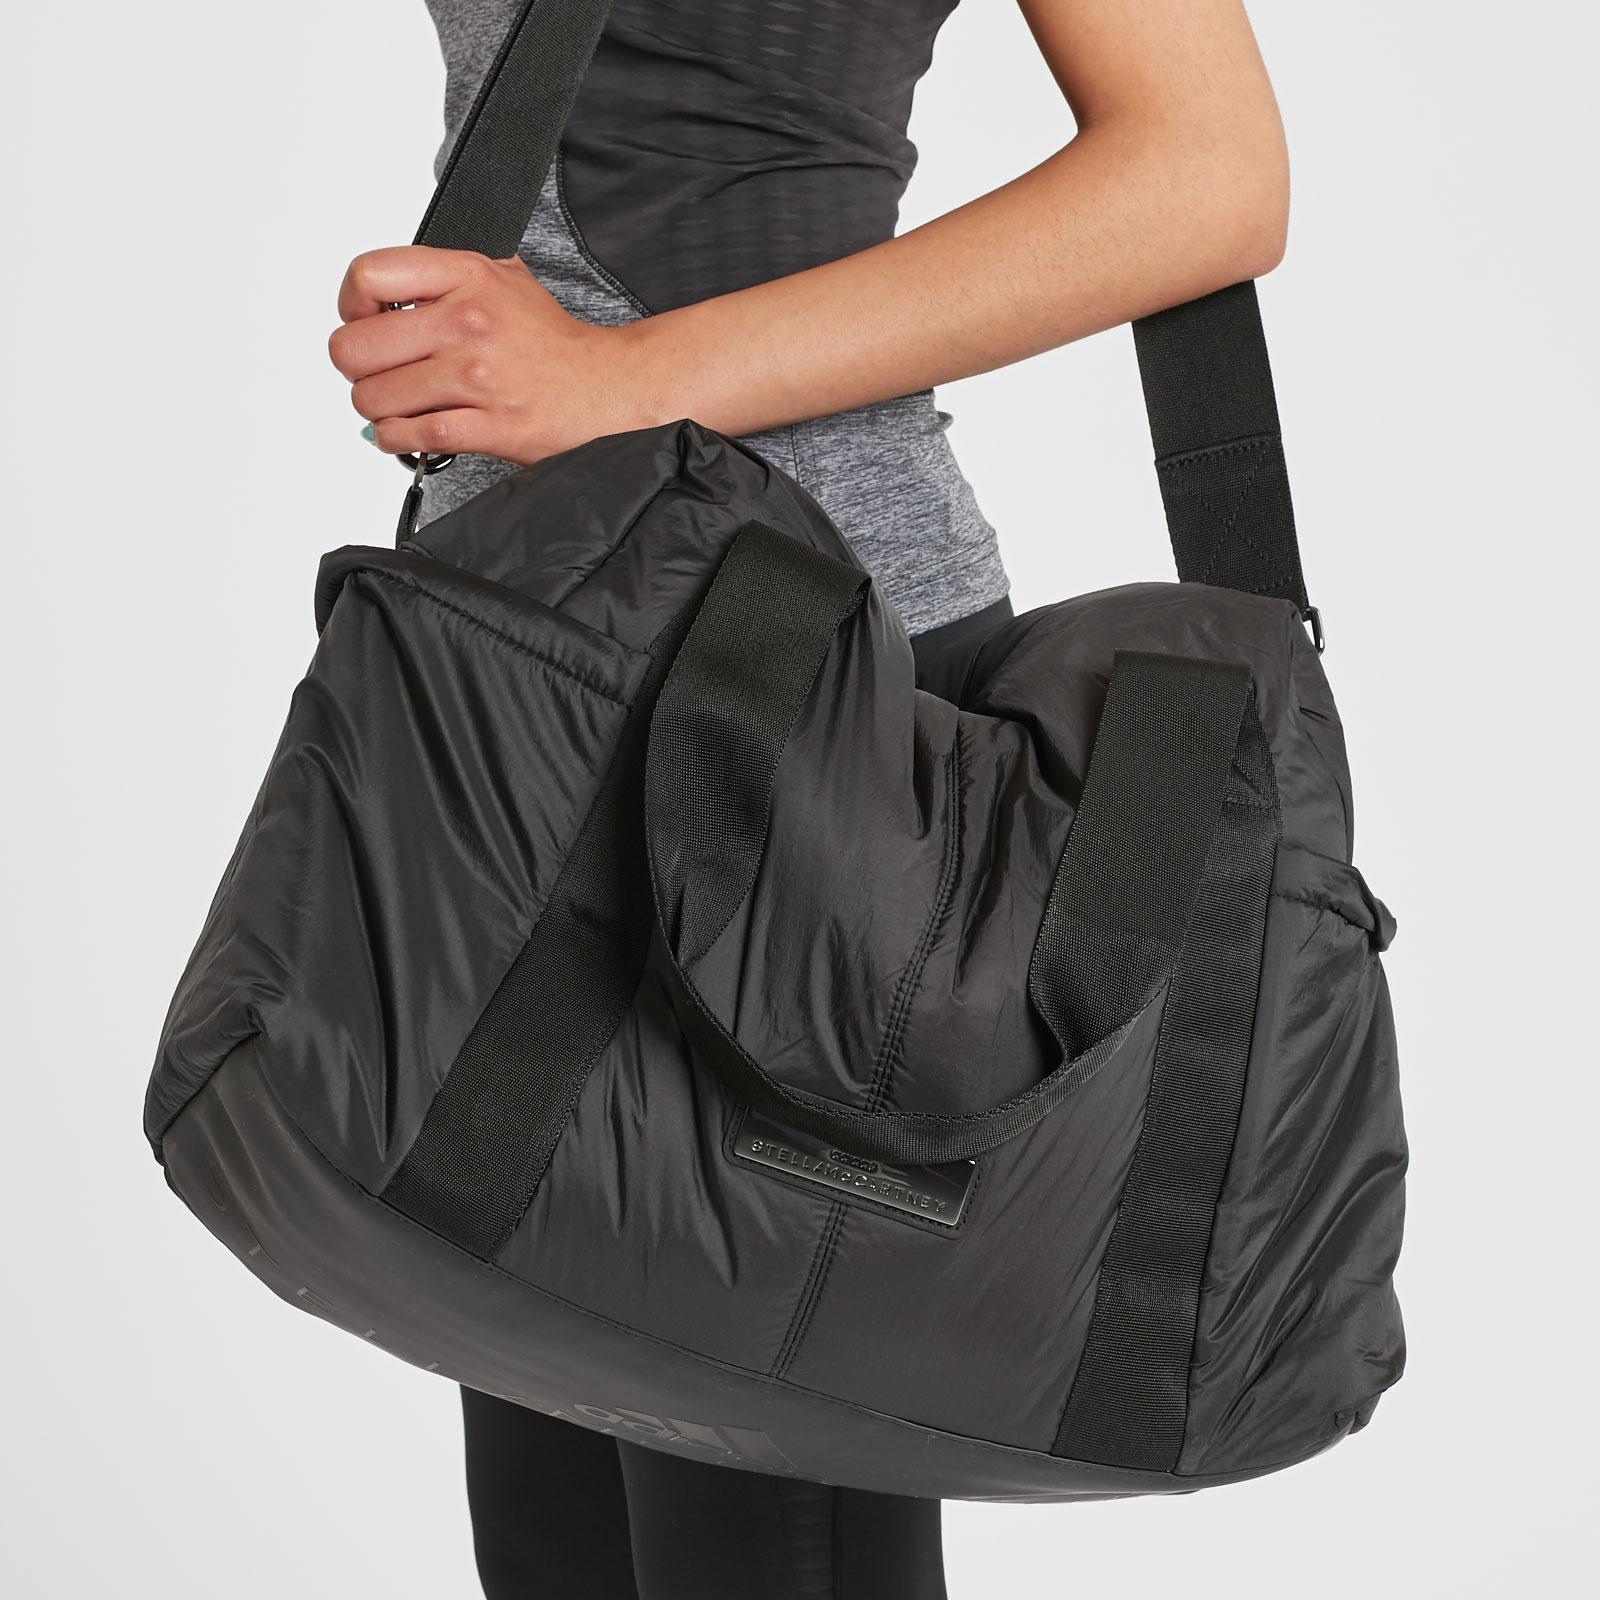 promo code 0190f 87b63 adidas by Stella McCartney Shipshape Bag M - 6. Close